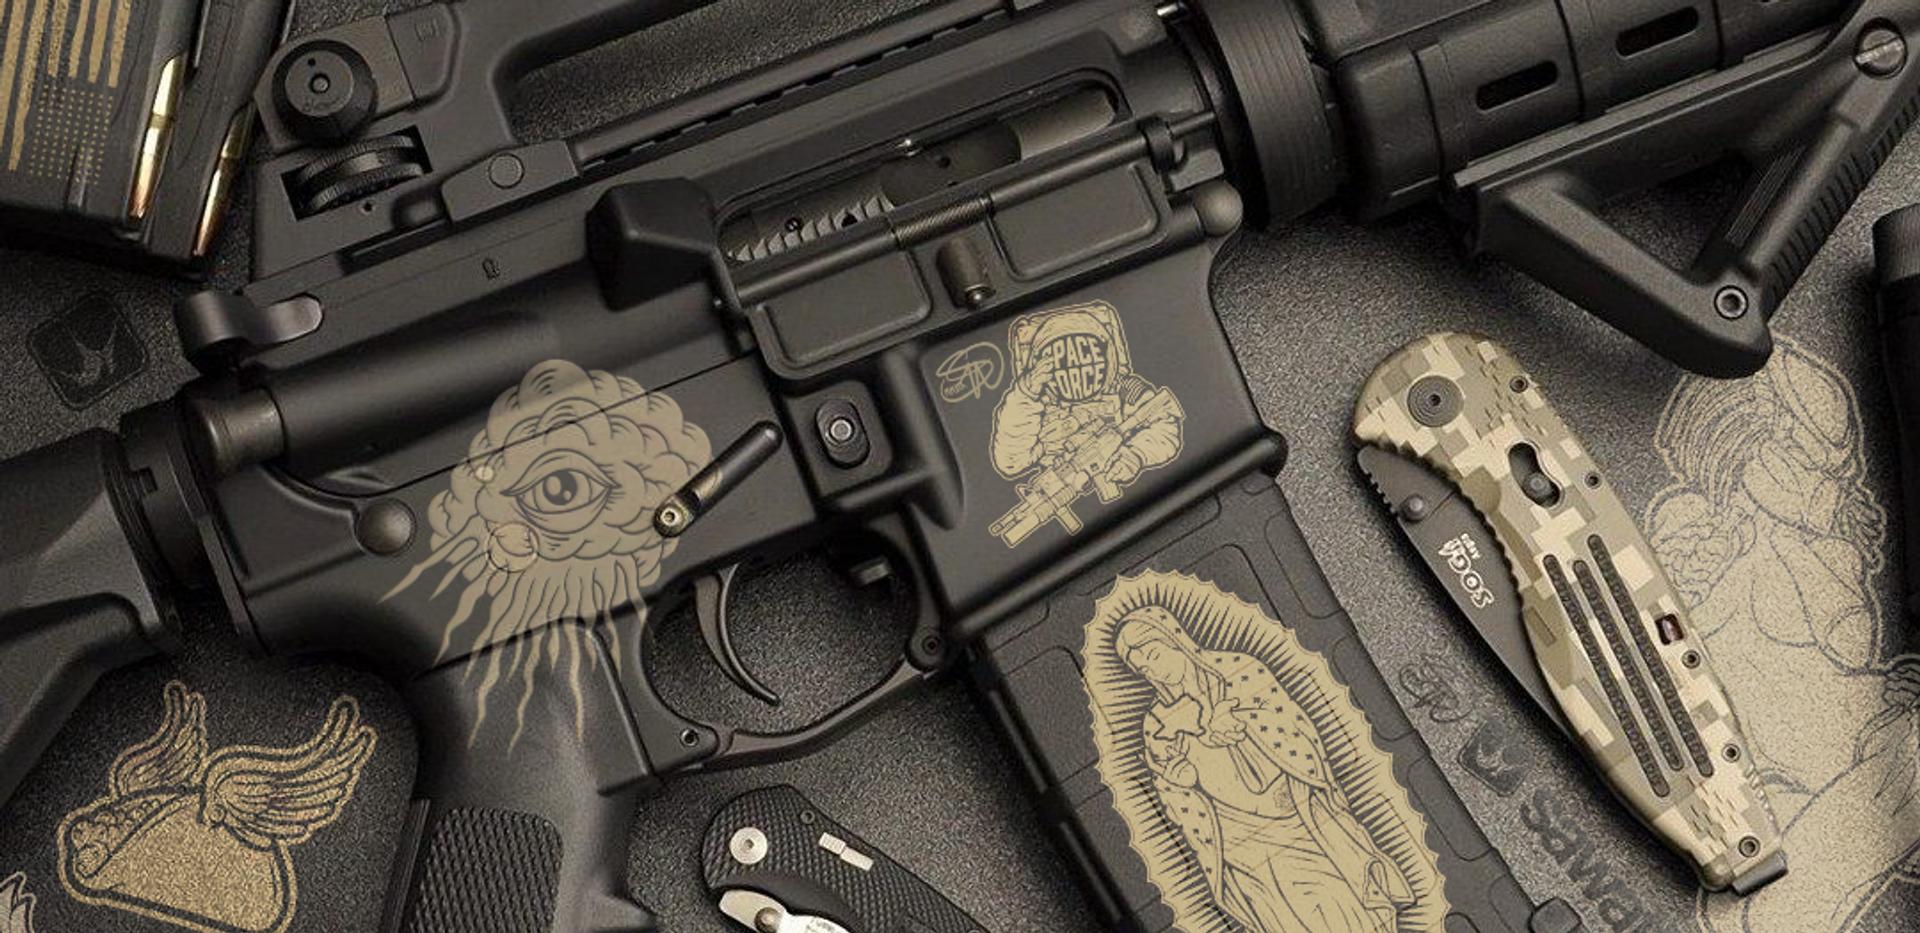 Fragout Firearms PMAG Magpul Laser engraving Artwork